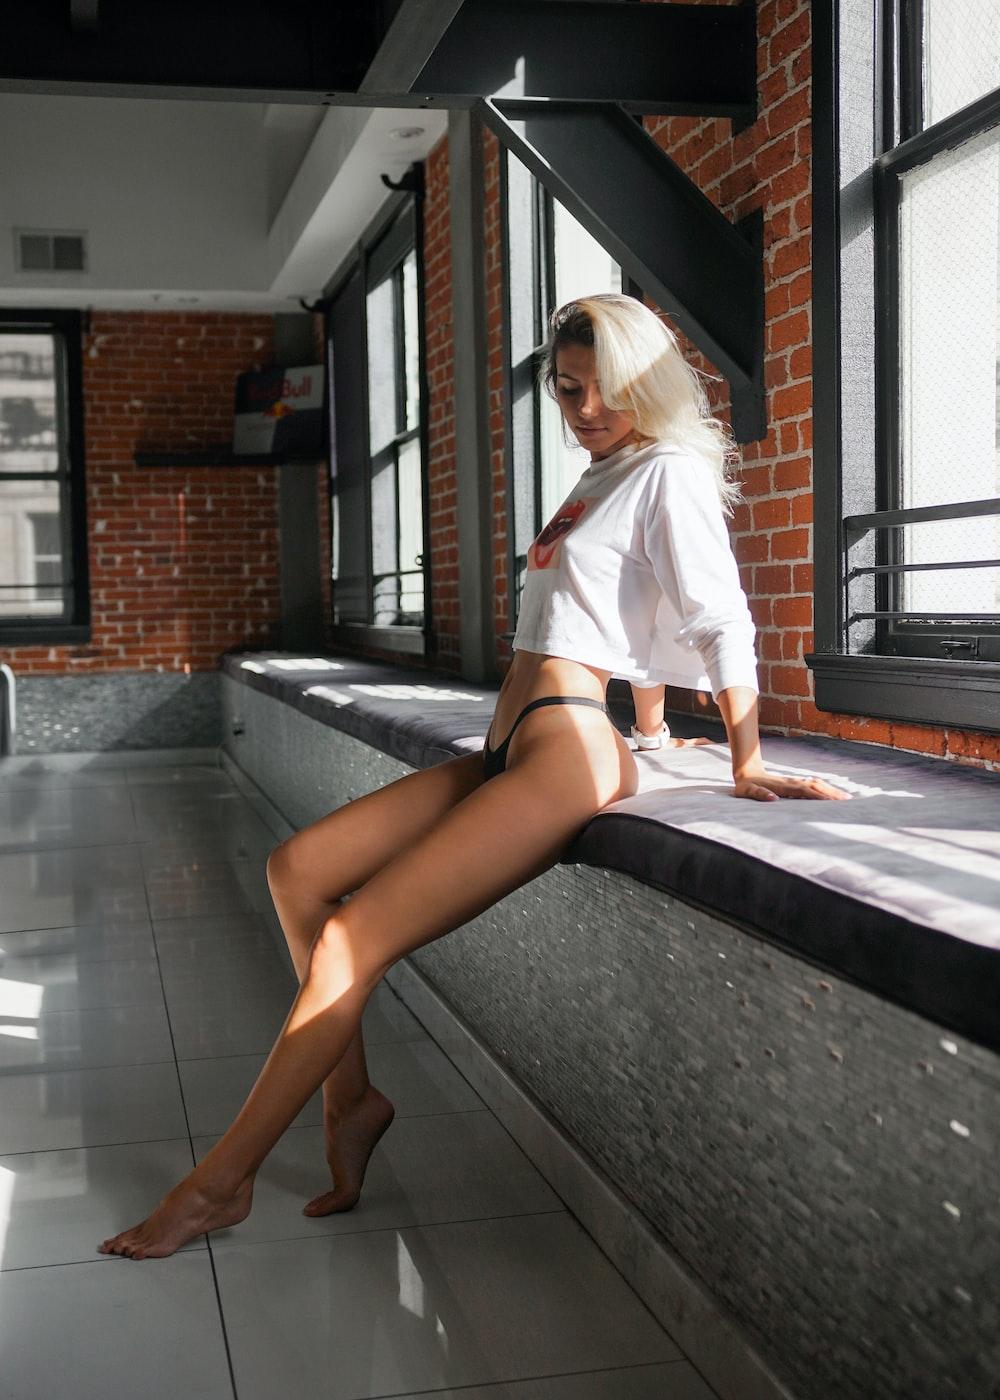 woman sitting near window